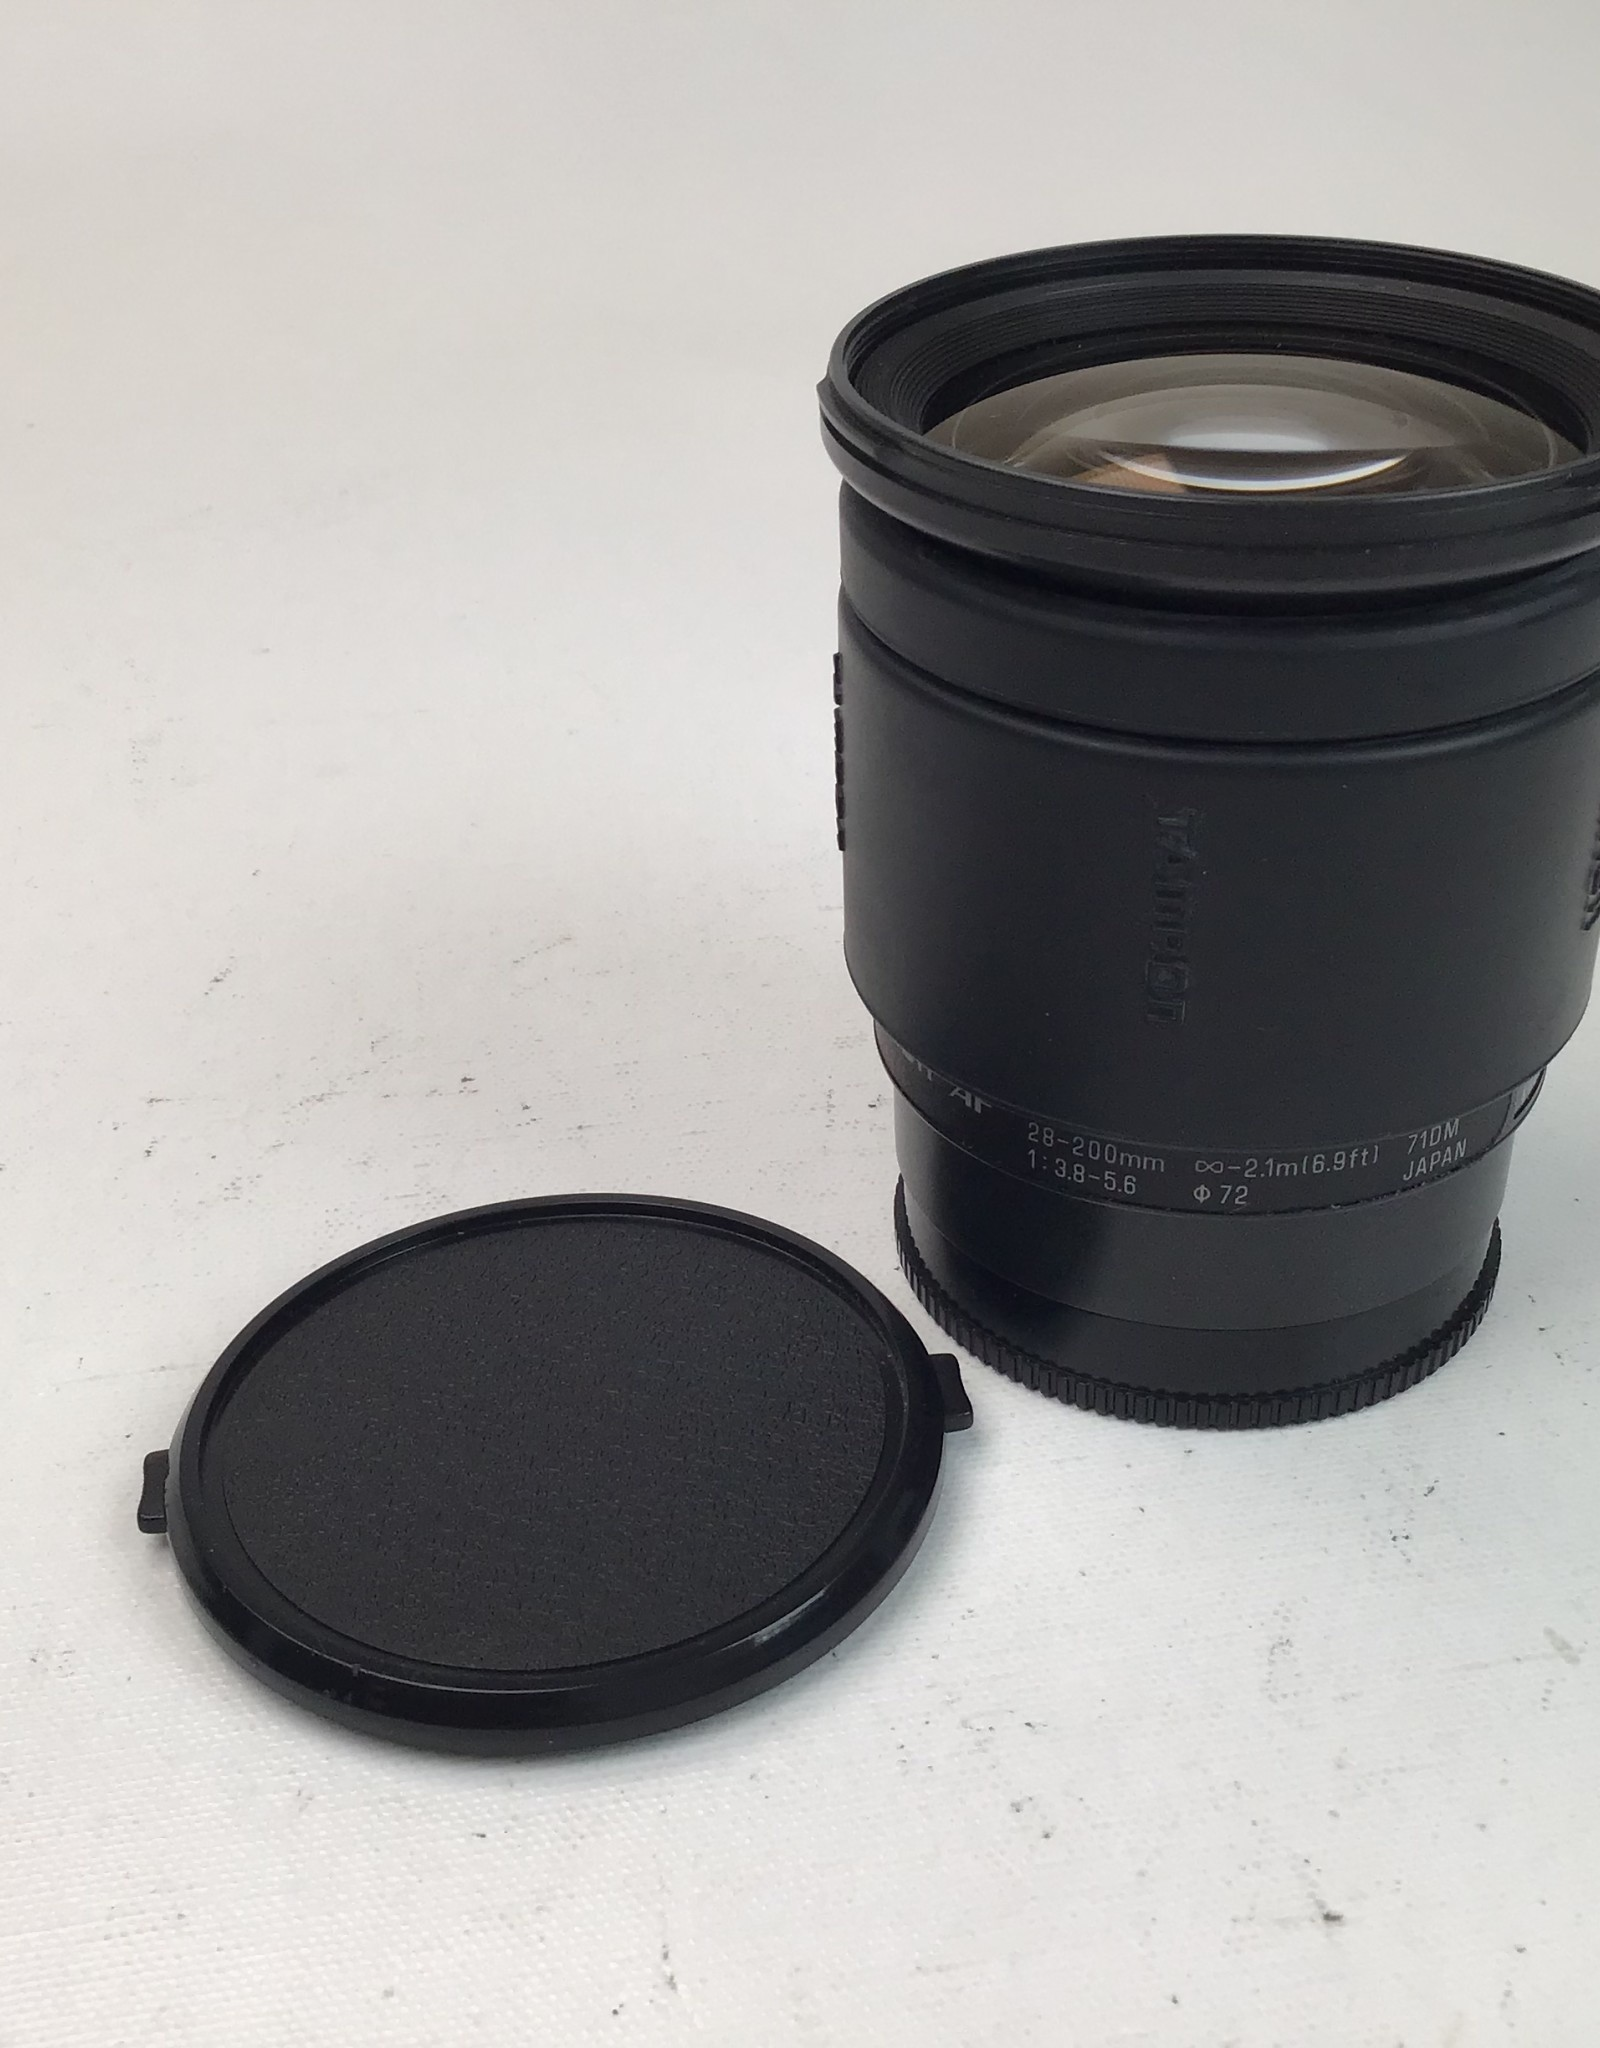 TAMRON Tamron 28-200mm f3.8-5.6 Lens For Maxxum Used Fair